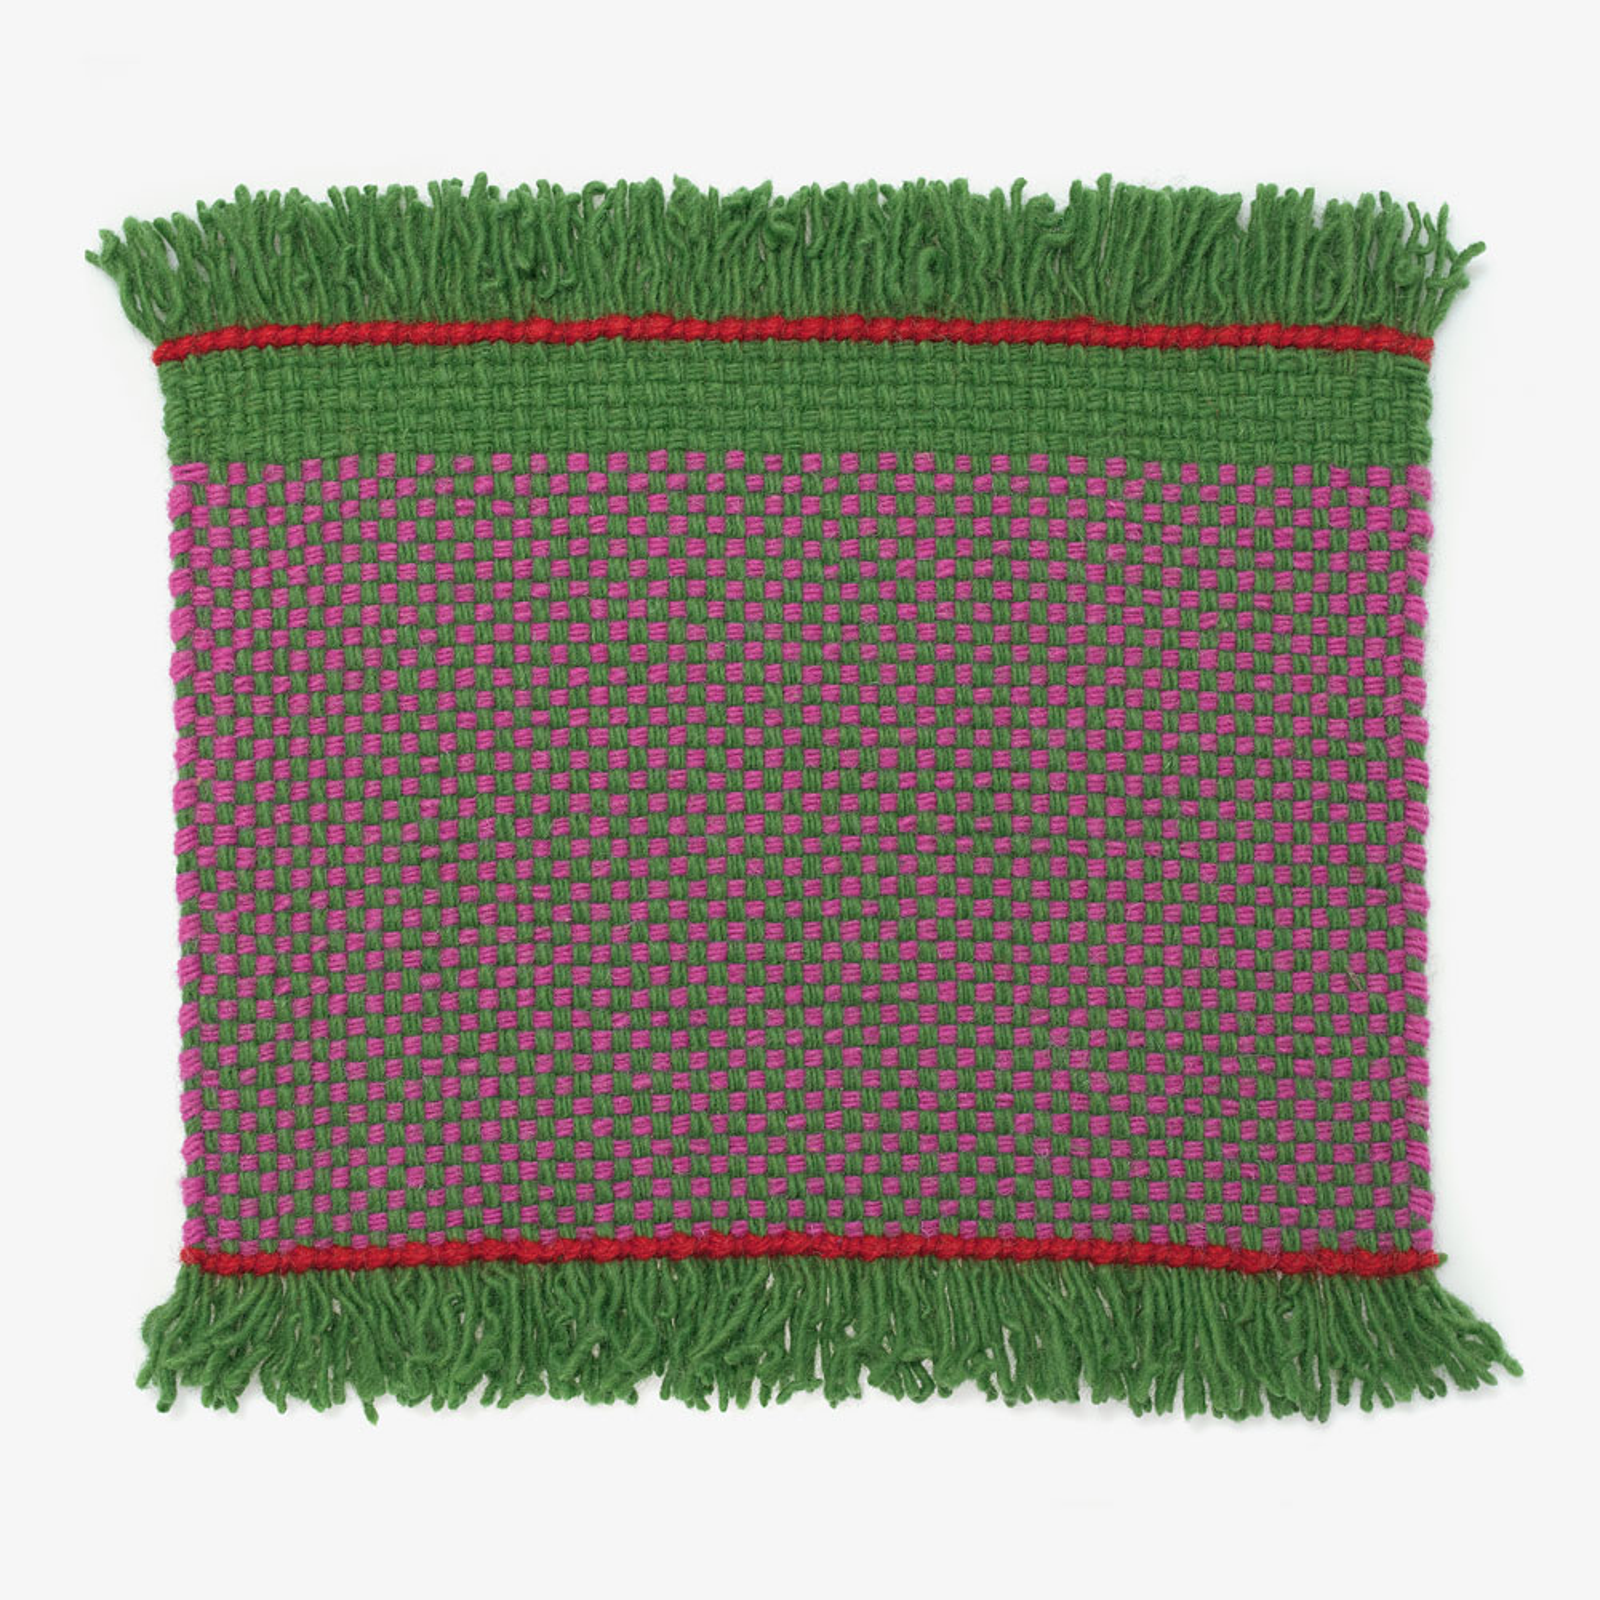 Kvadrat Rugs - Duotone - Farbe 0671 - Detailansicht